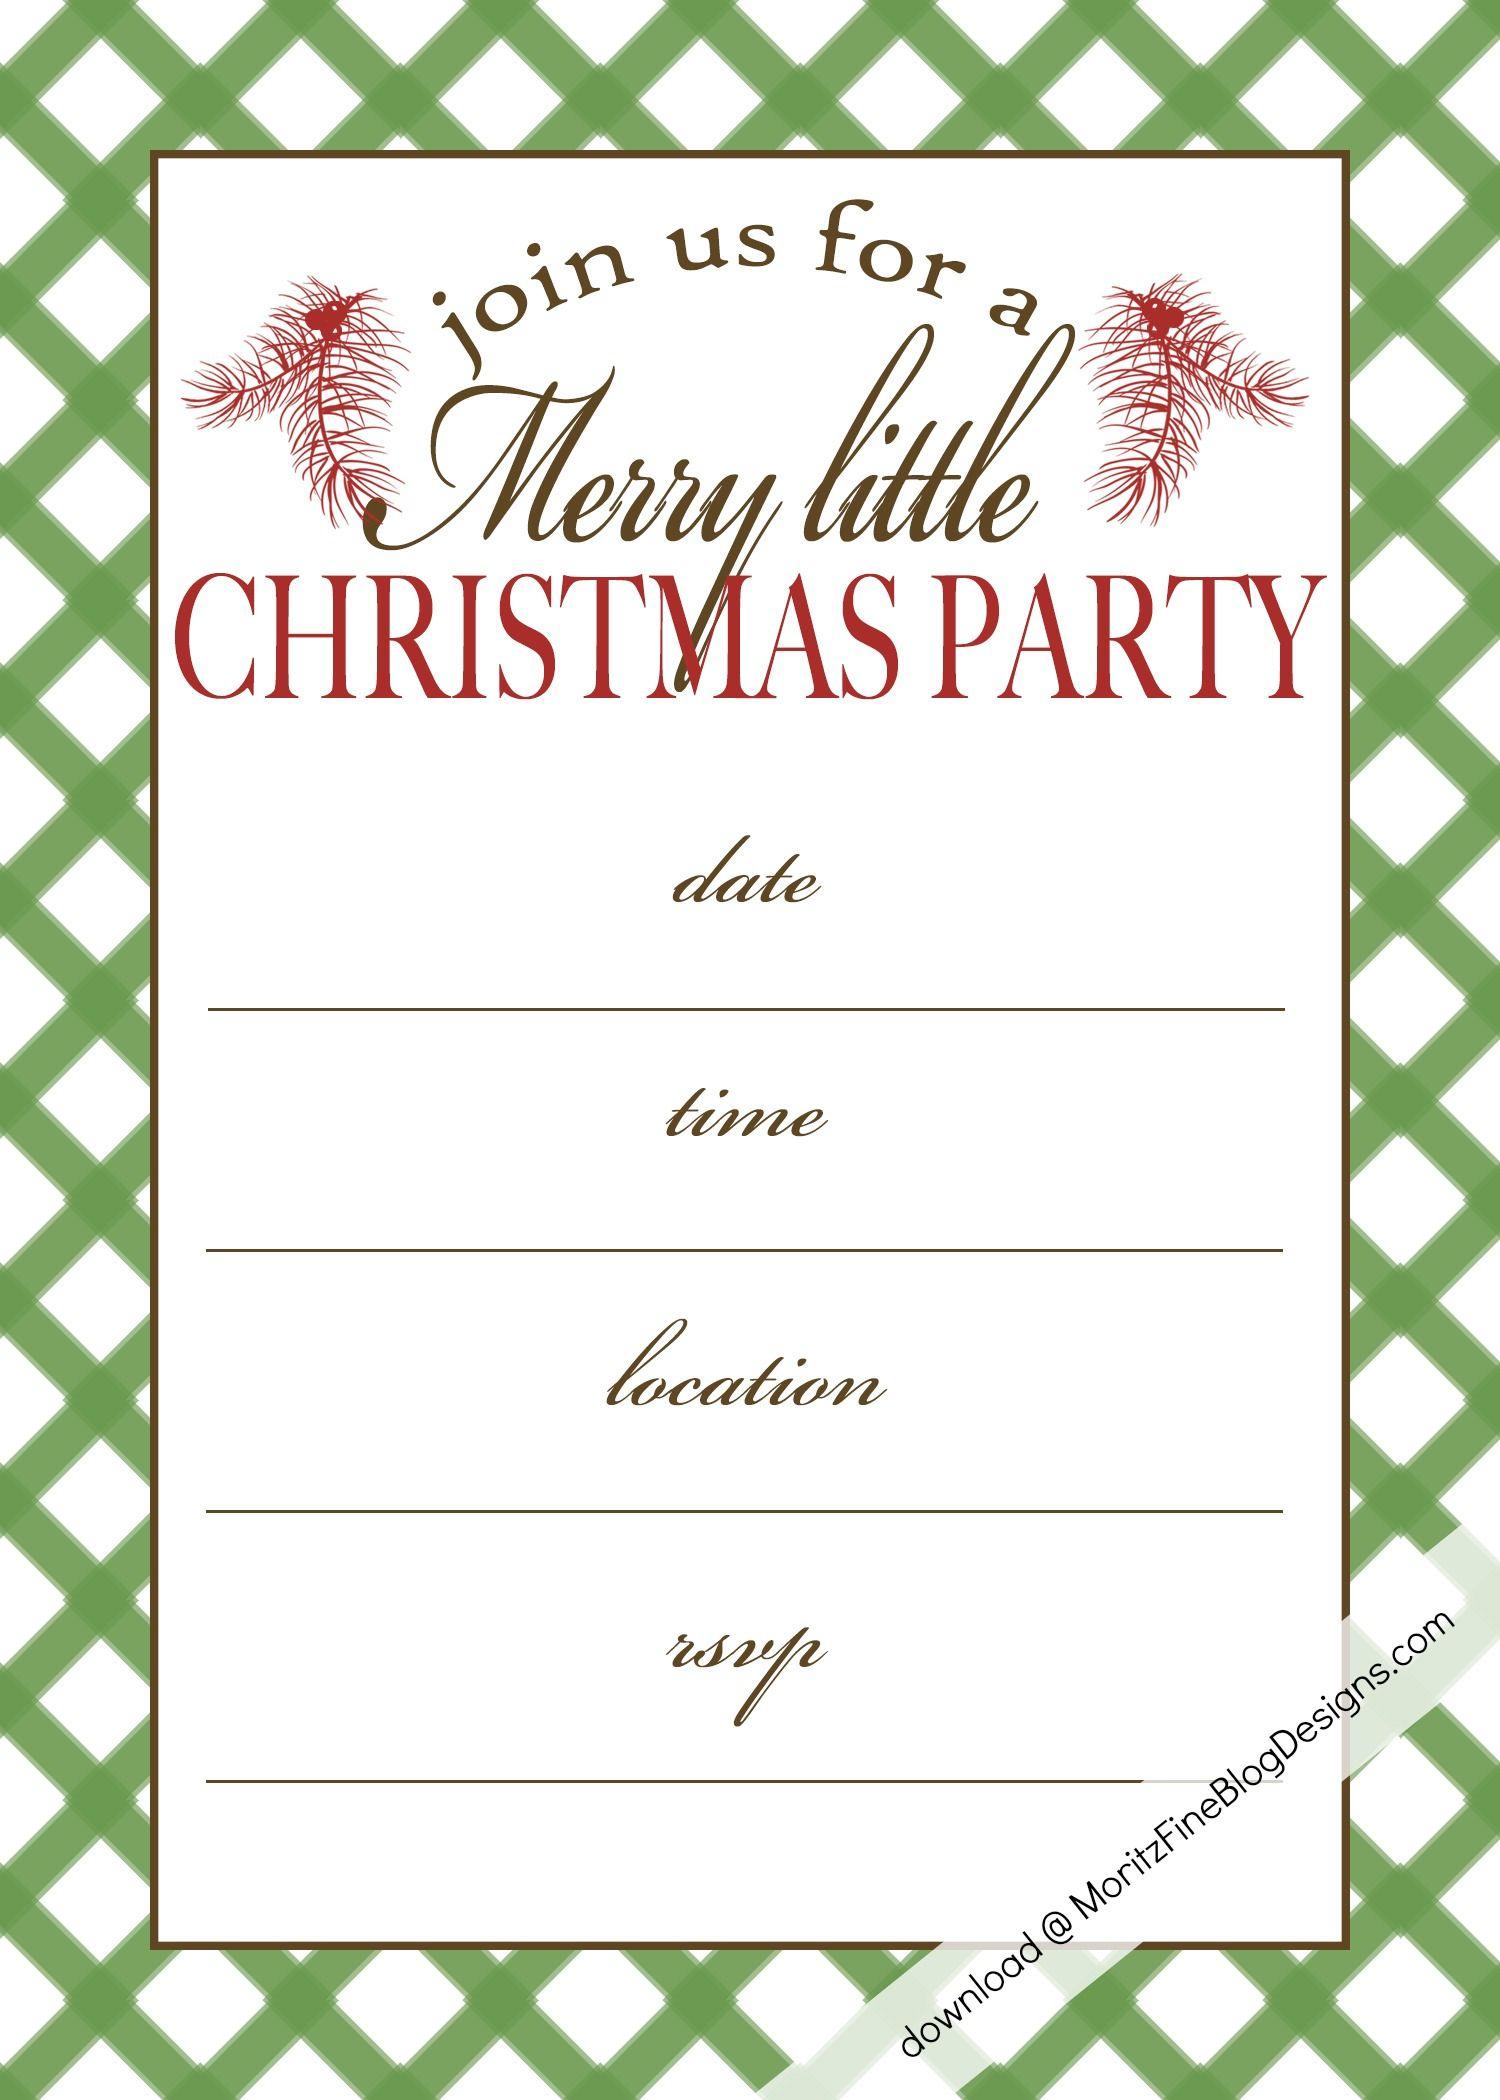 Free Printable Christmas Party Invitation | Christmas:print - Free Printable Christmas Party Invitations